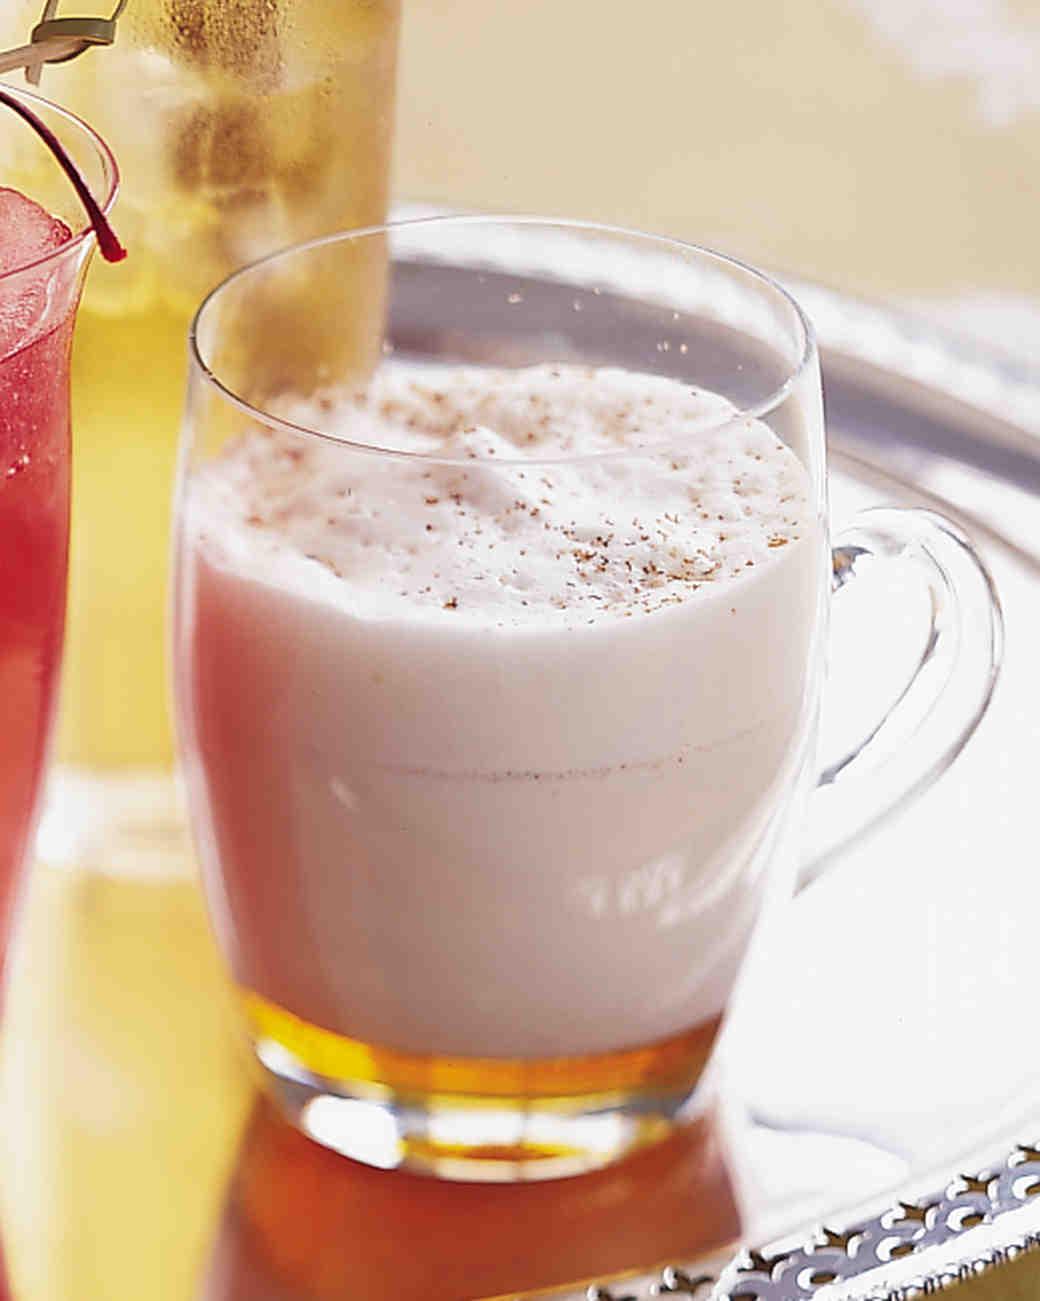 wedding-mocktail-recipes-nonalcoholic-drinks-spiced-steamed-milk-0915.jpg